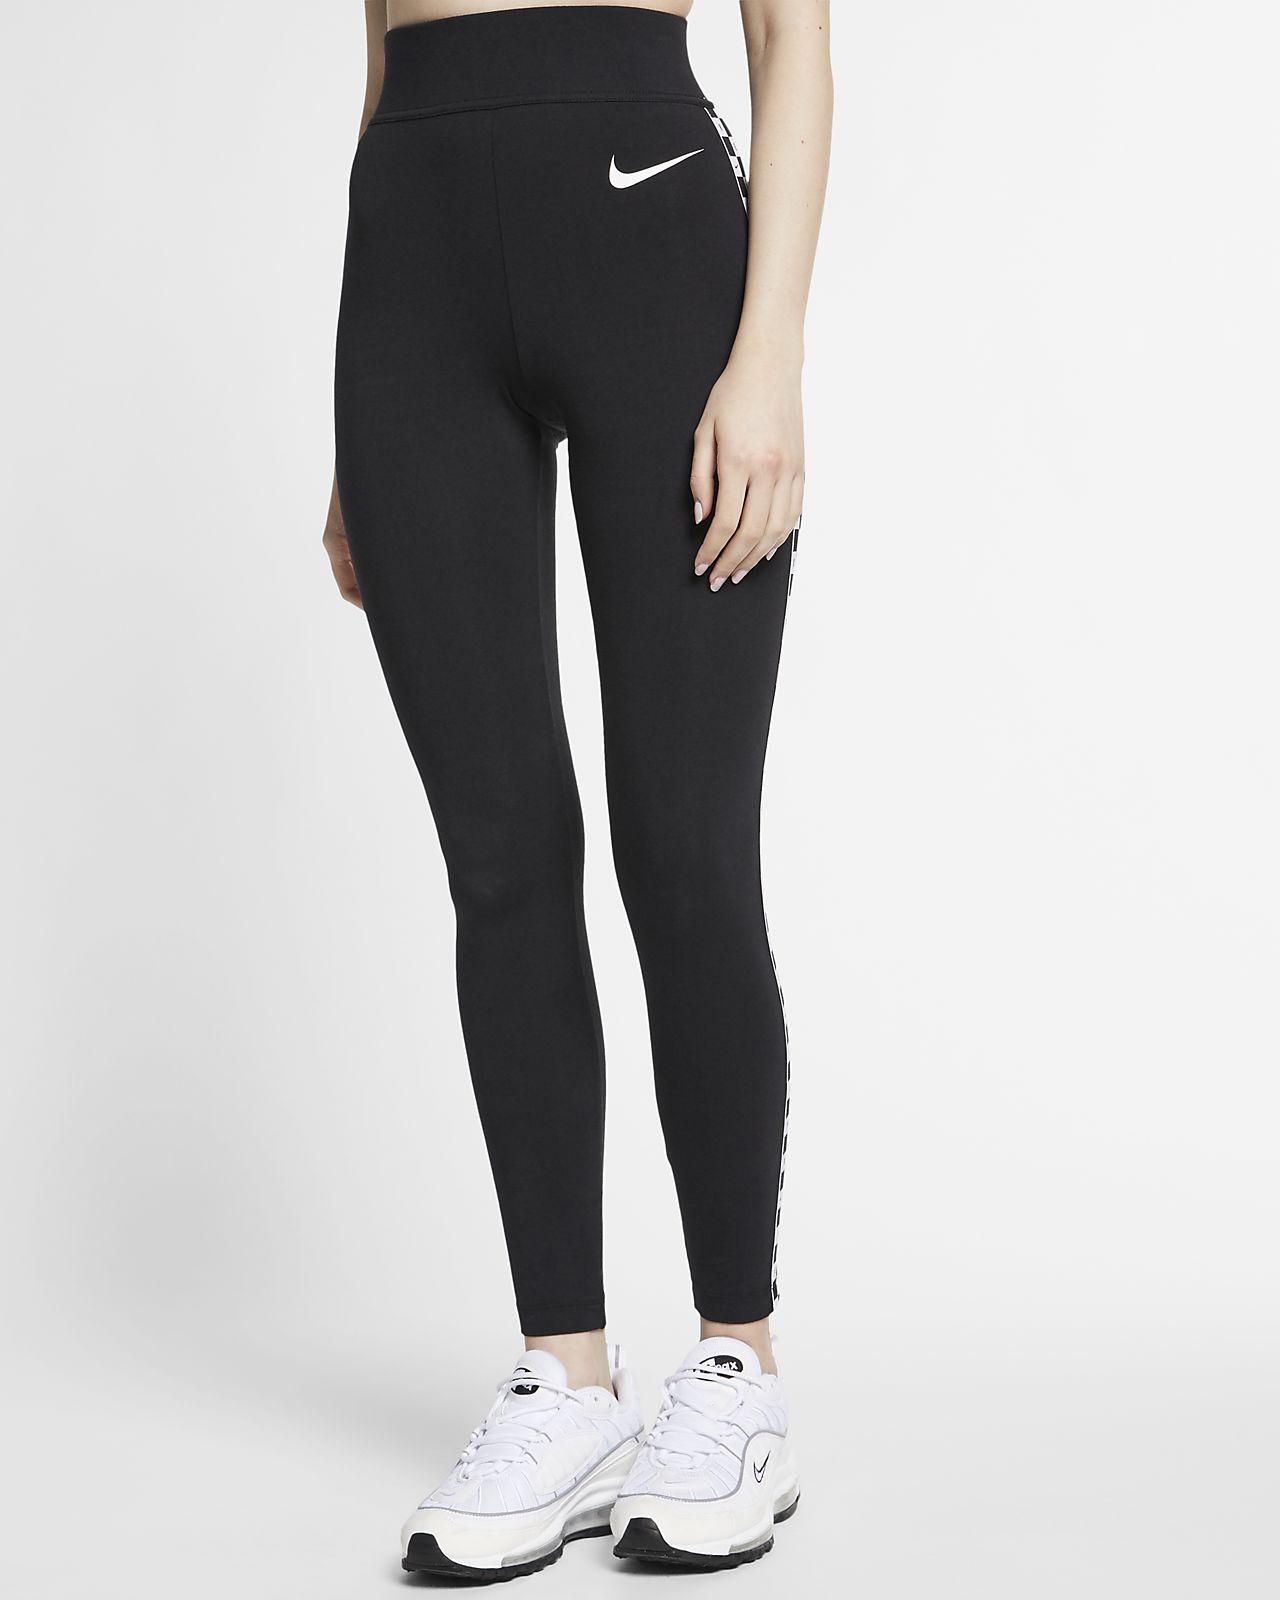 42ec0a420fffa Nike Sportswear Women's Graphic Leggings. Nike.com AE